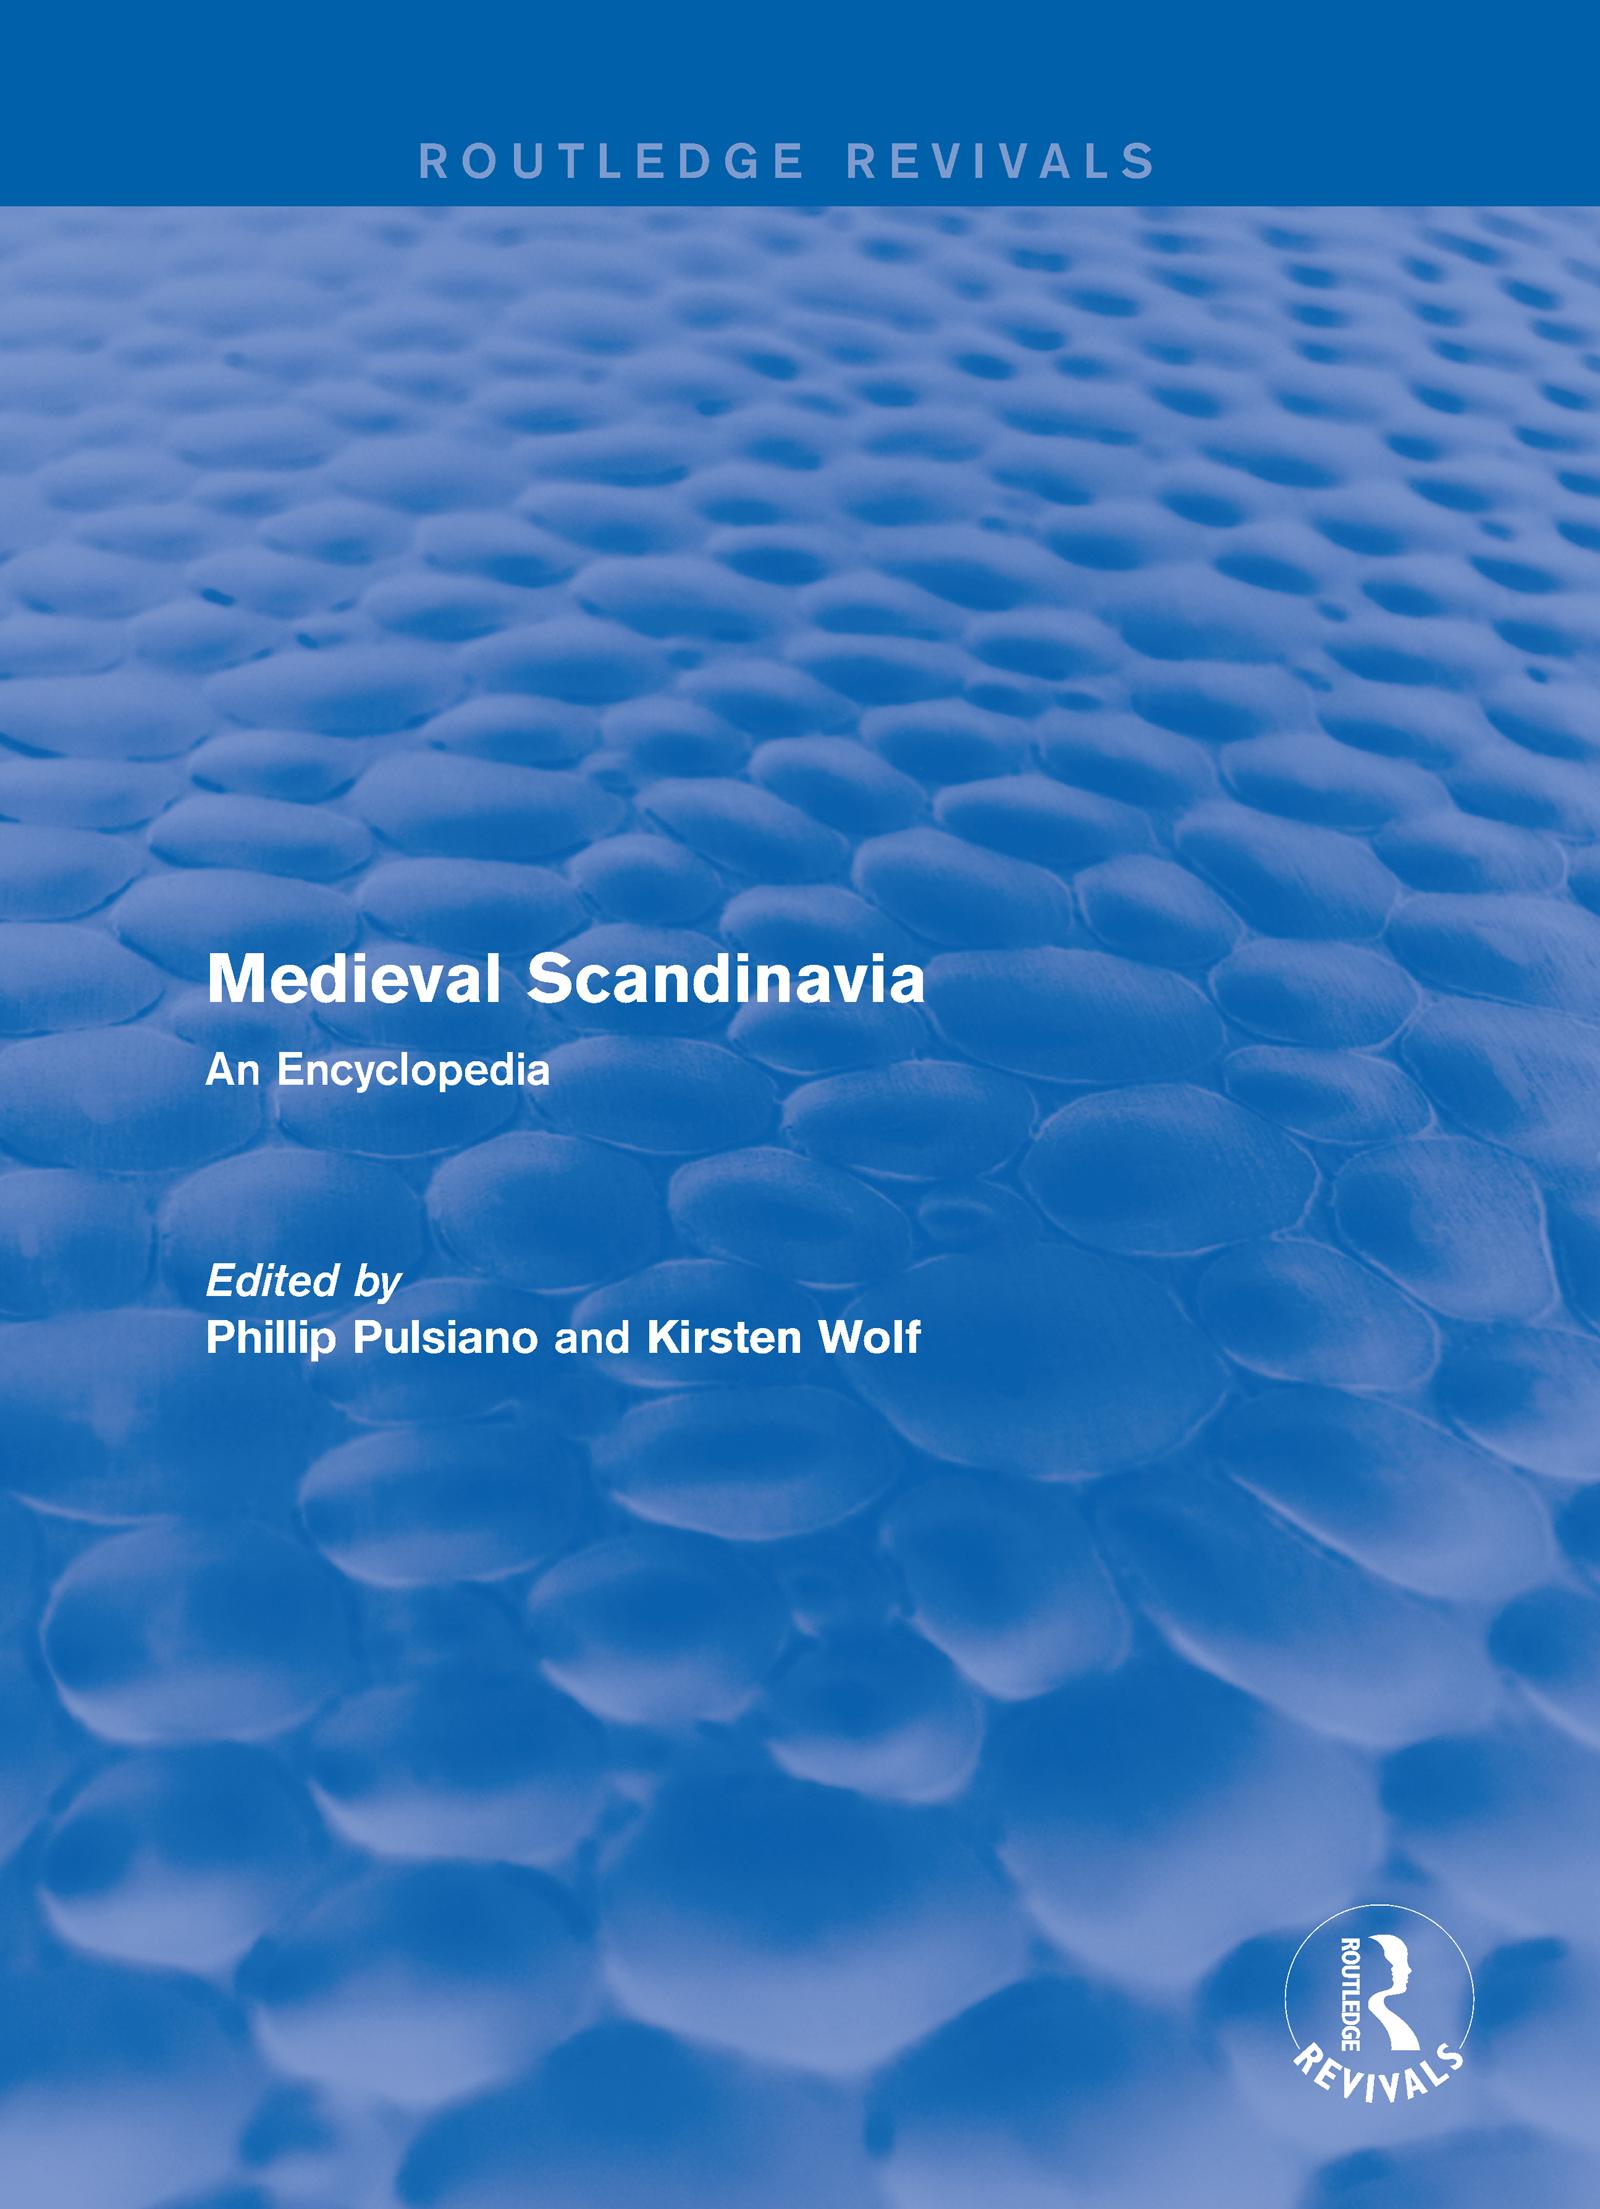 Routledge Revivals: Medieval Scandinavia (1993): An Encyclopedia book cover